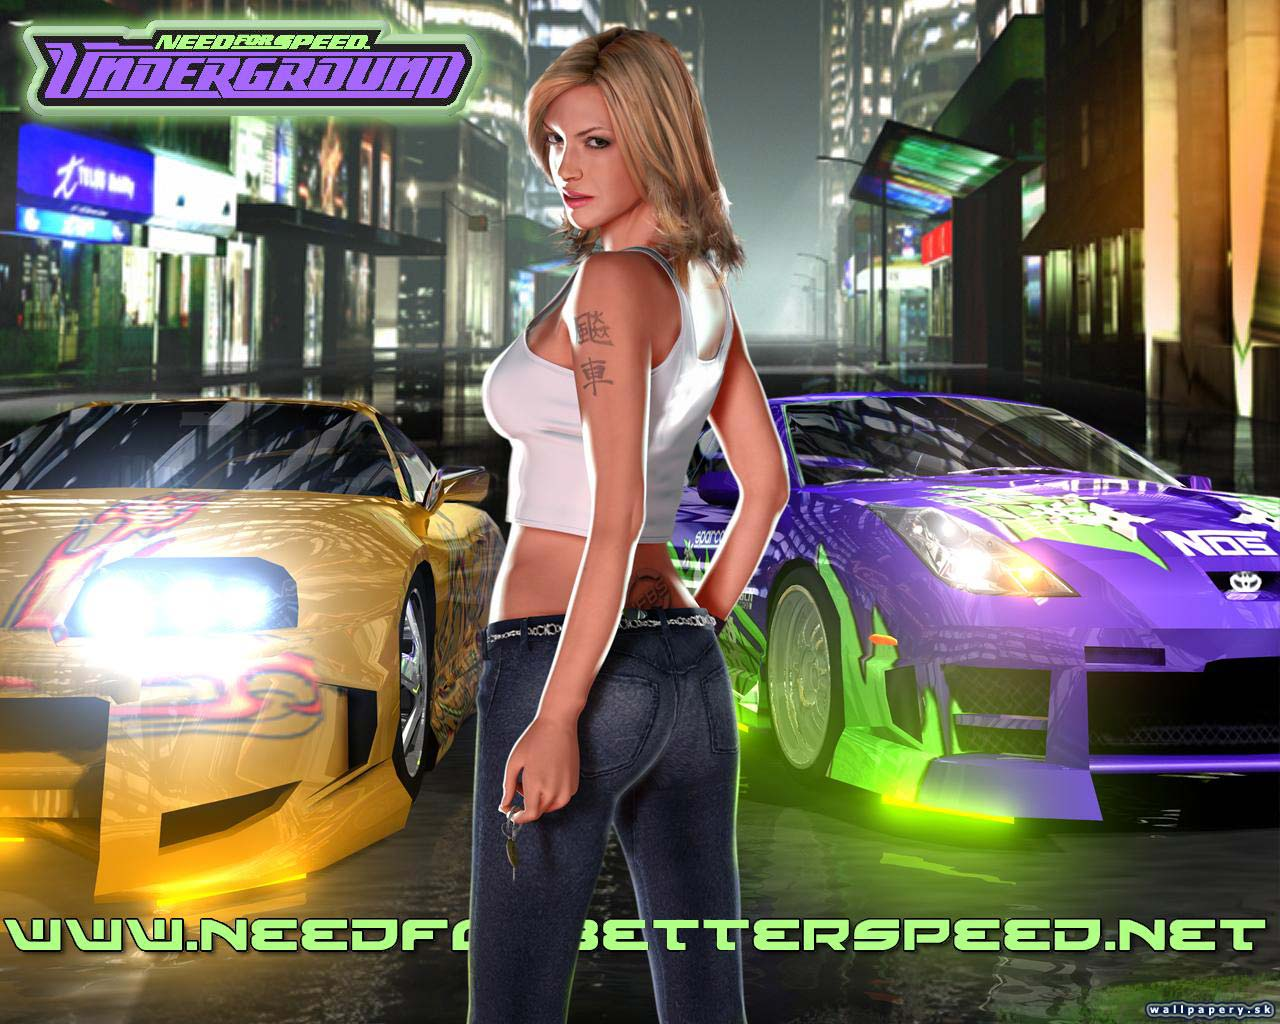 Need for speed underground nude mod sexy image